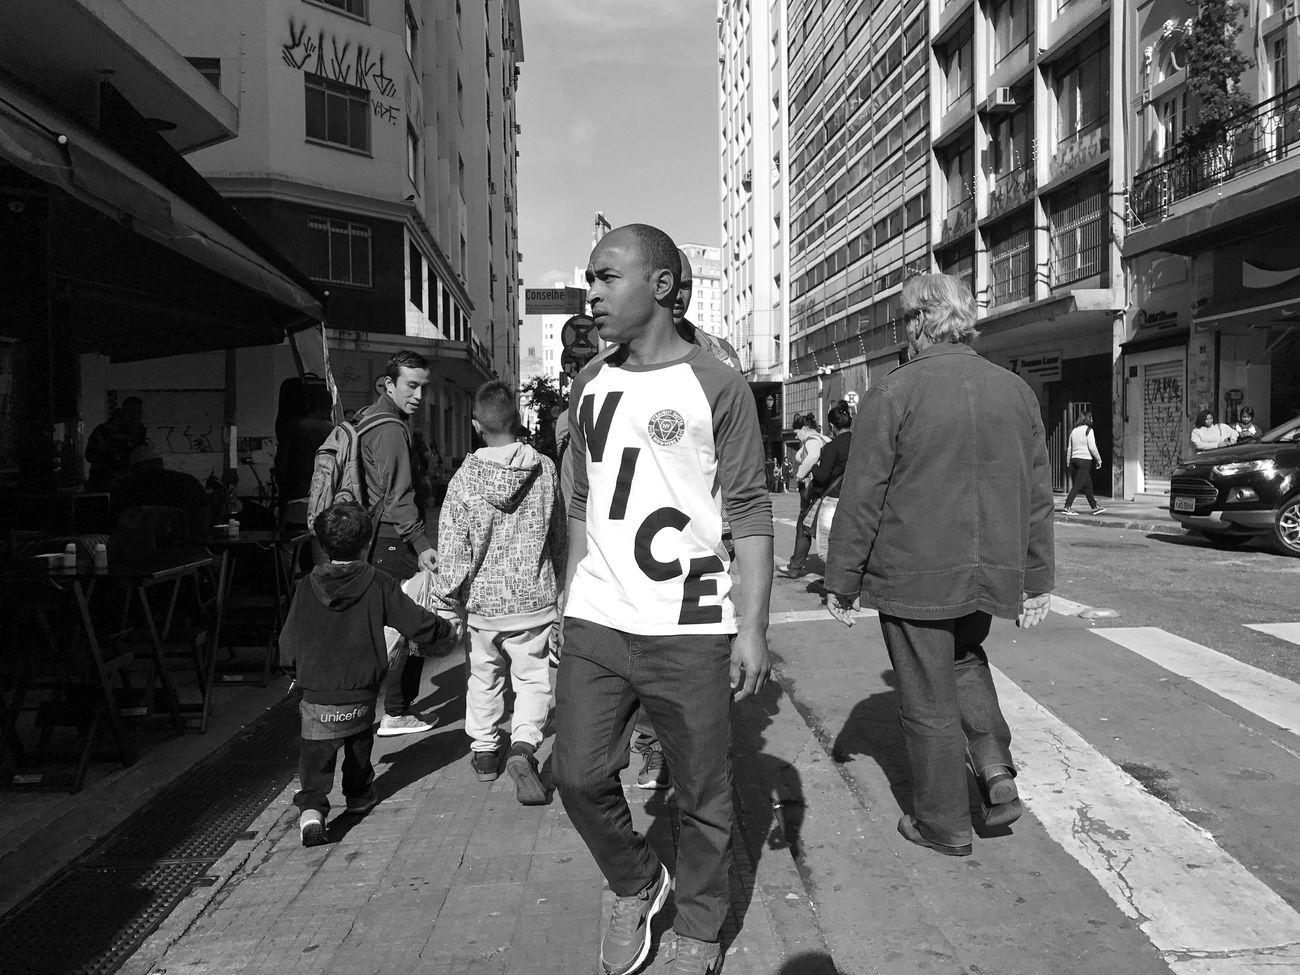 """Nice"". July, 2017 Streetphotography Blackandwhite Saopaulo"